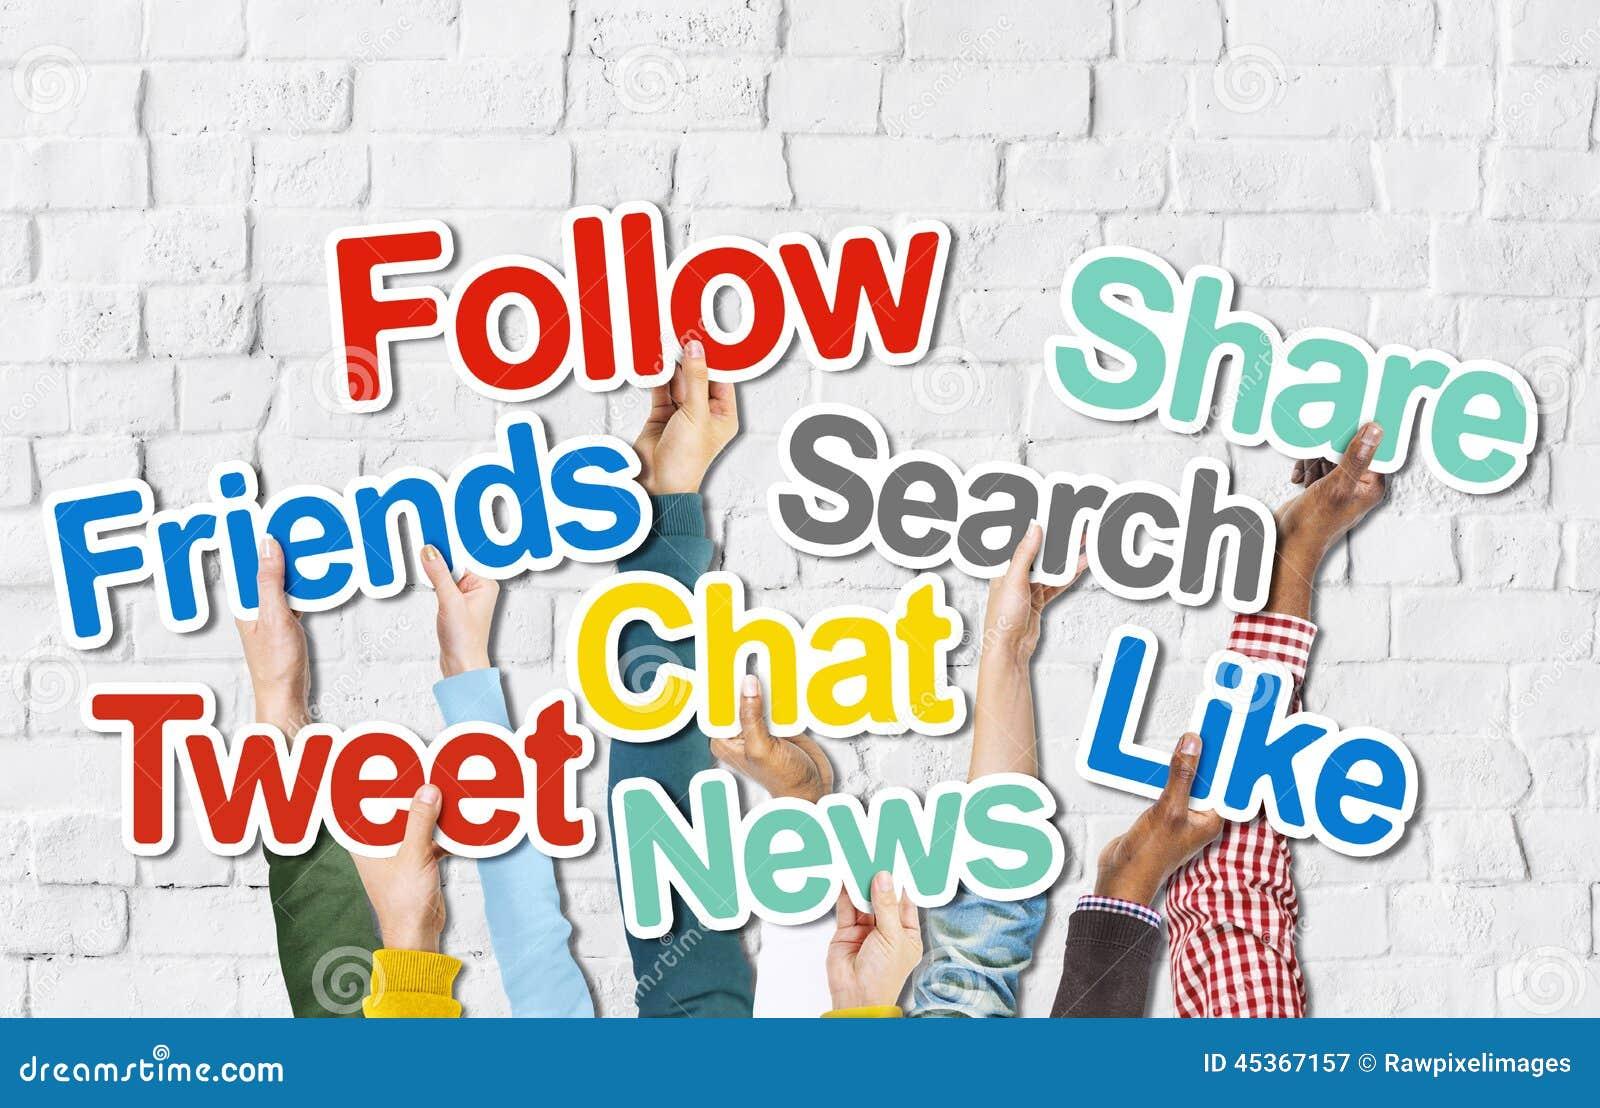 Diverse Hands Holding Social Media Words